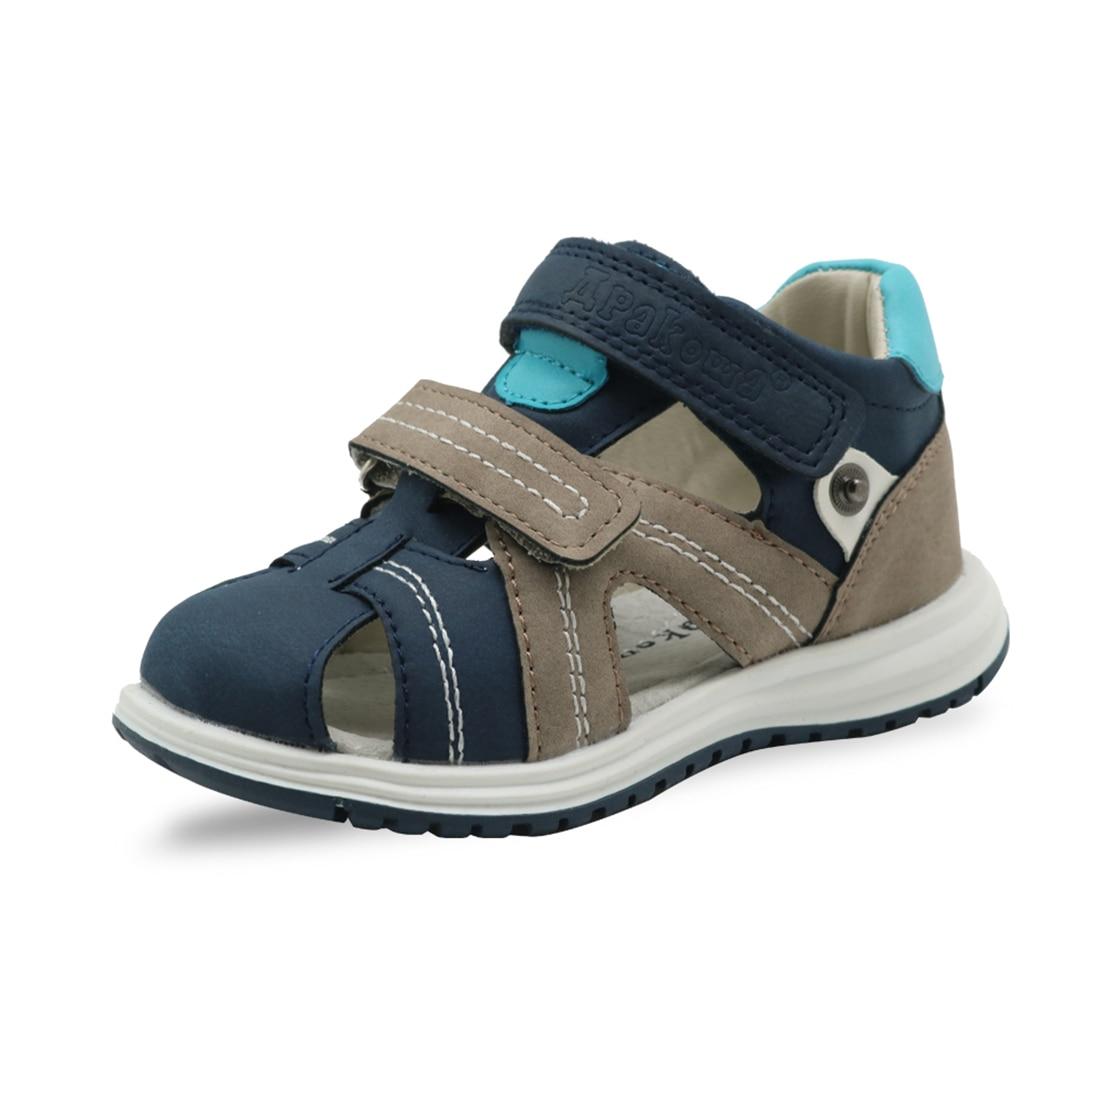 Toddler Kids Summer Closed Toe Sandals